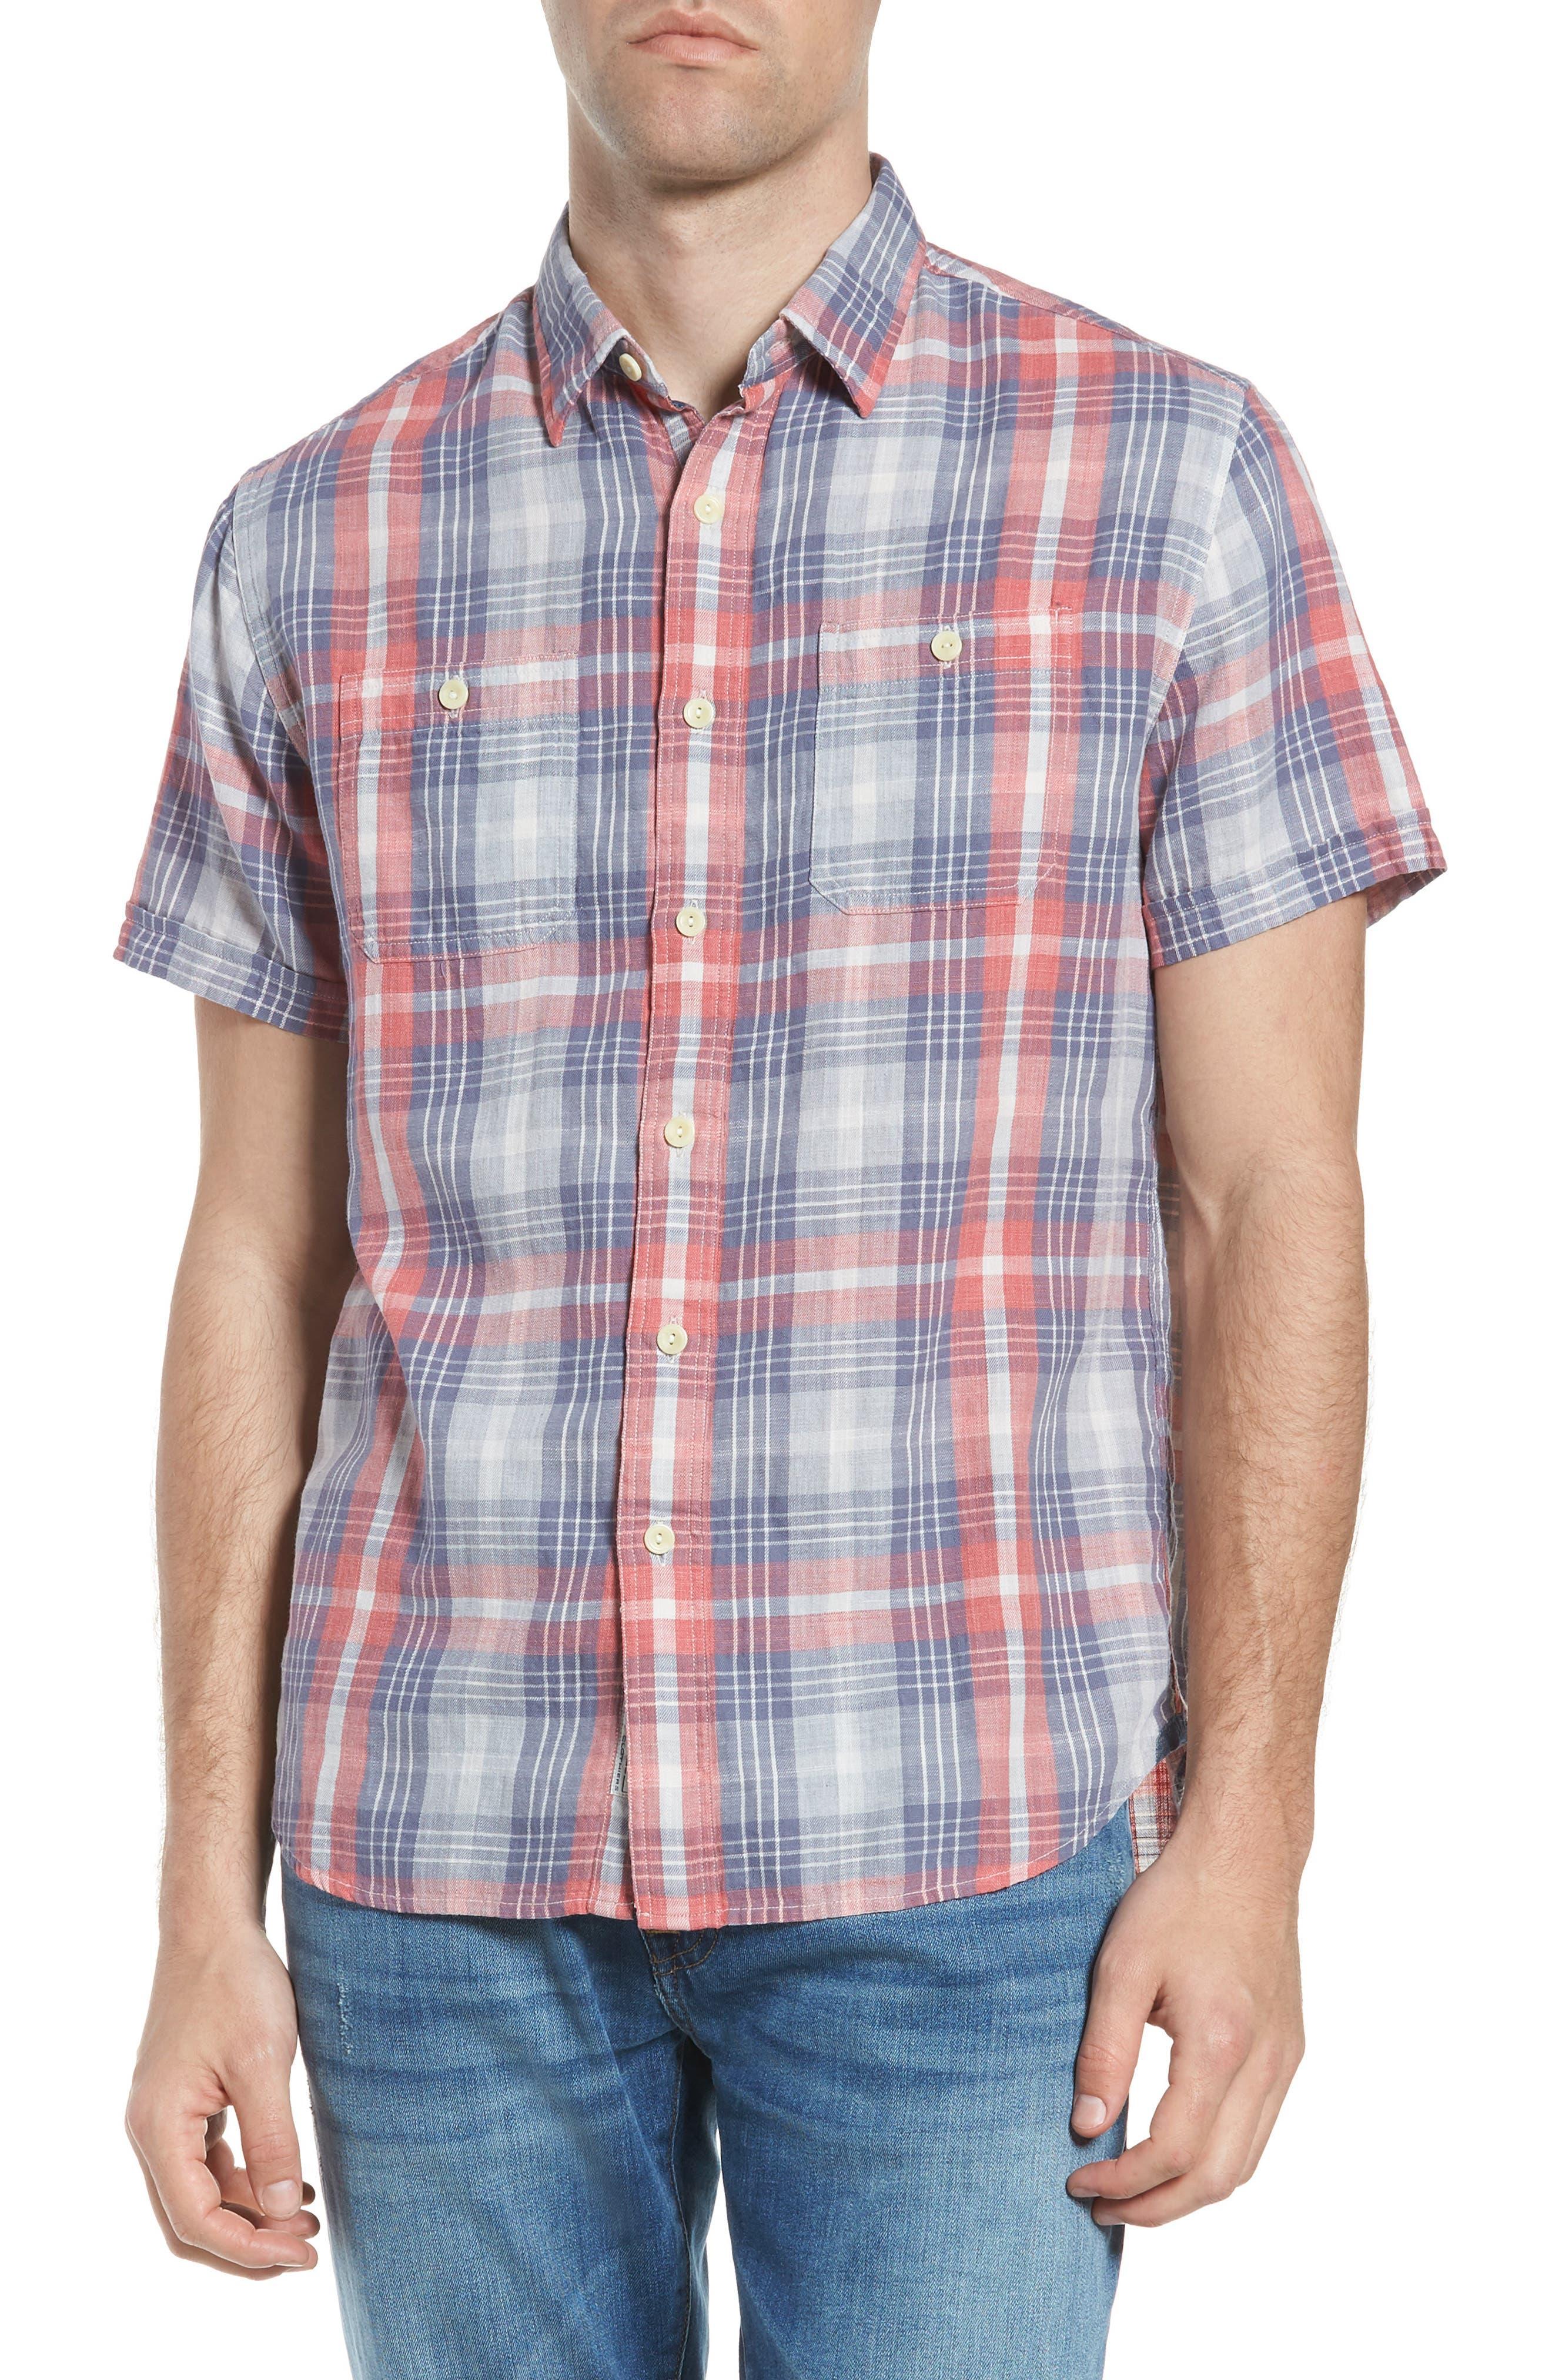 Reynolds Short Sleeve Sport Shirt,                             Main thumbnail 1, color,                             Red Gray Plaid